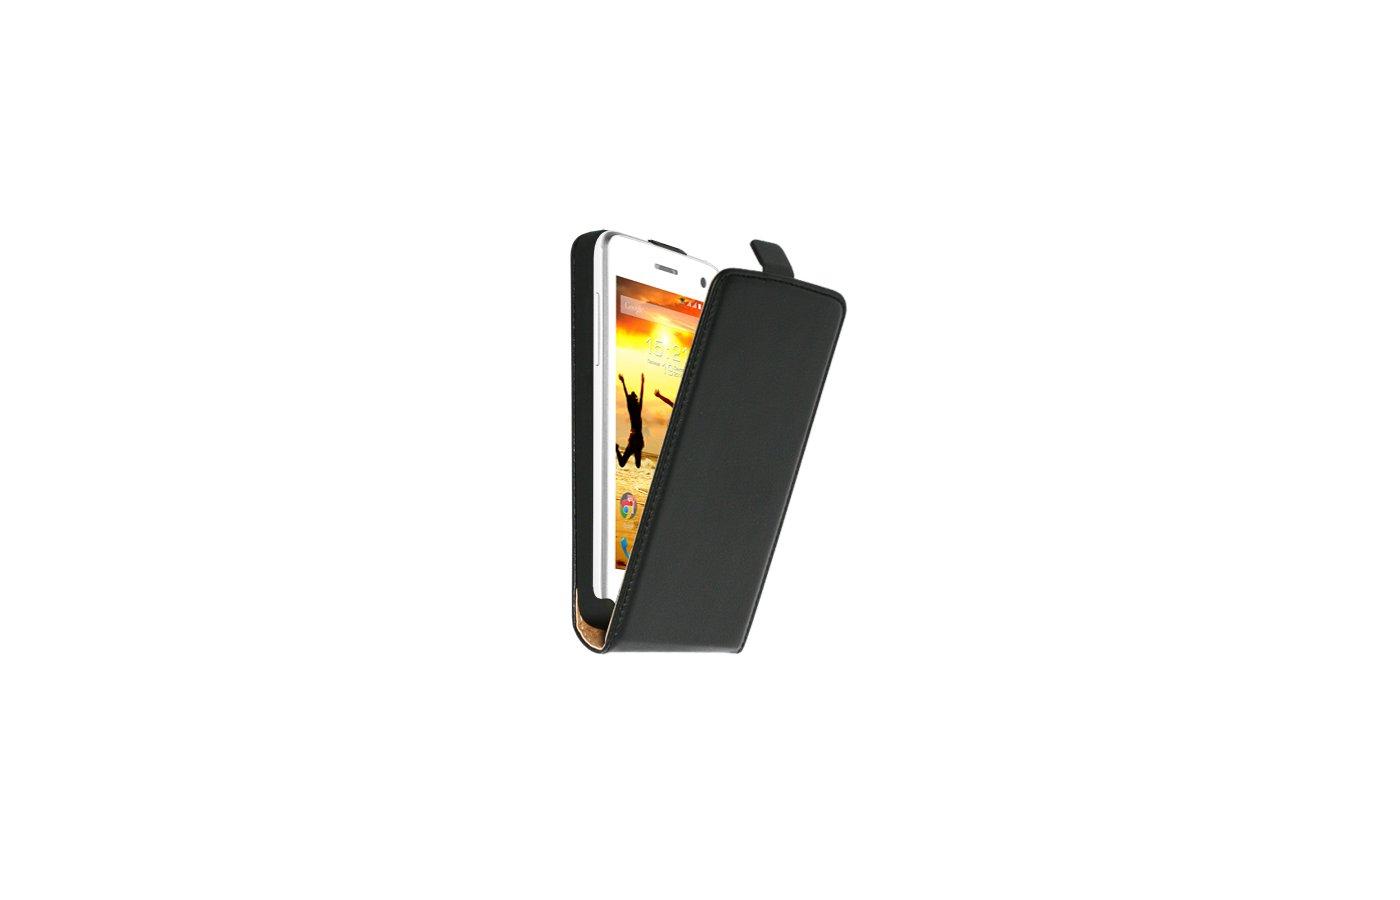 Чехол Nobby Comfort для FLY IQ4490i Era Nano 10 PU черный